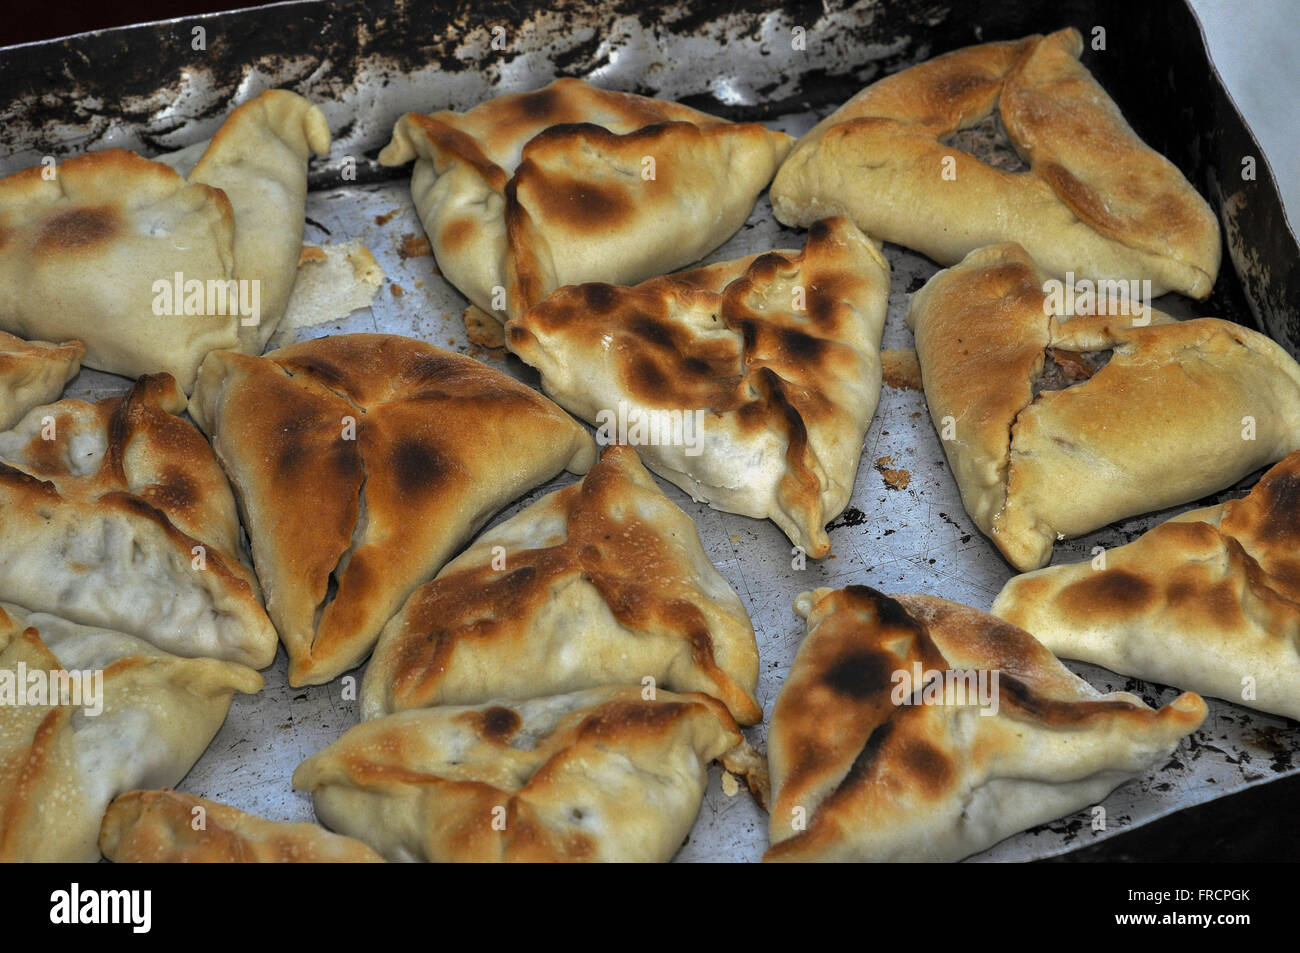 Esfihas in Chefs Gastronomic Festival held at the Praca Praca Carlos Gomes - Stock Image